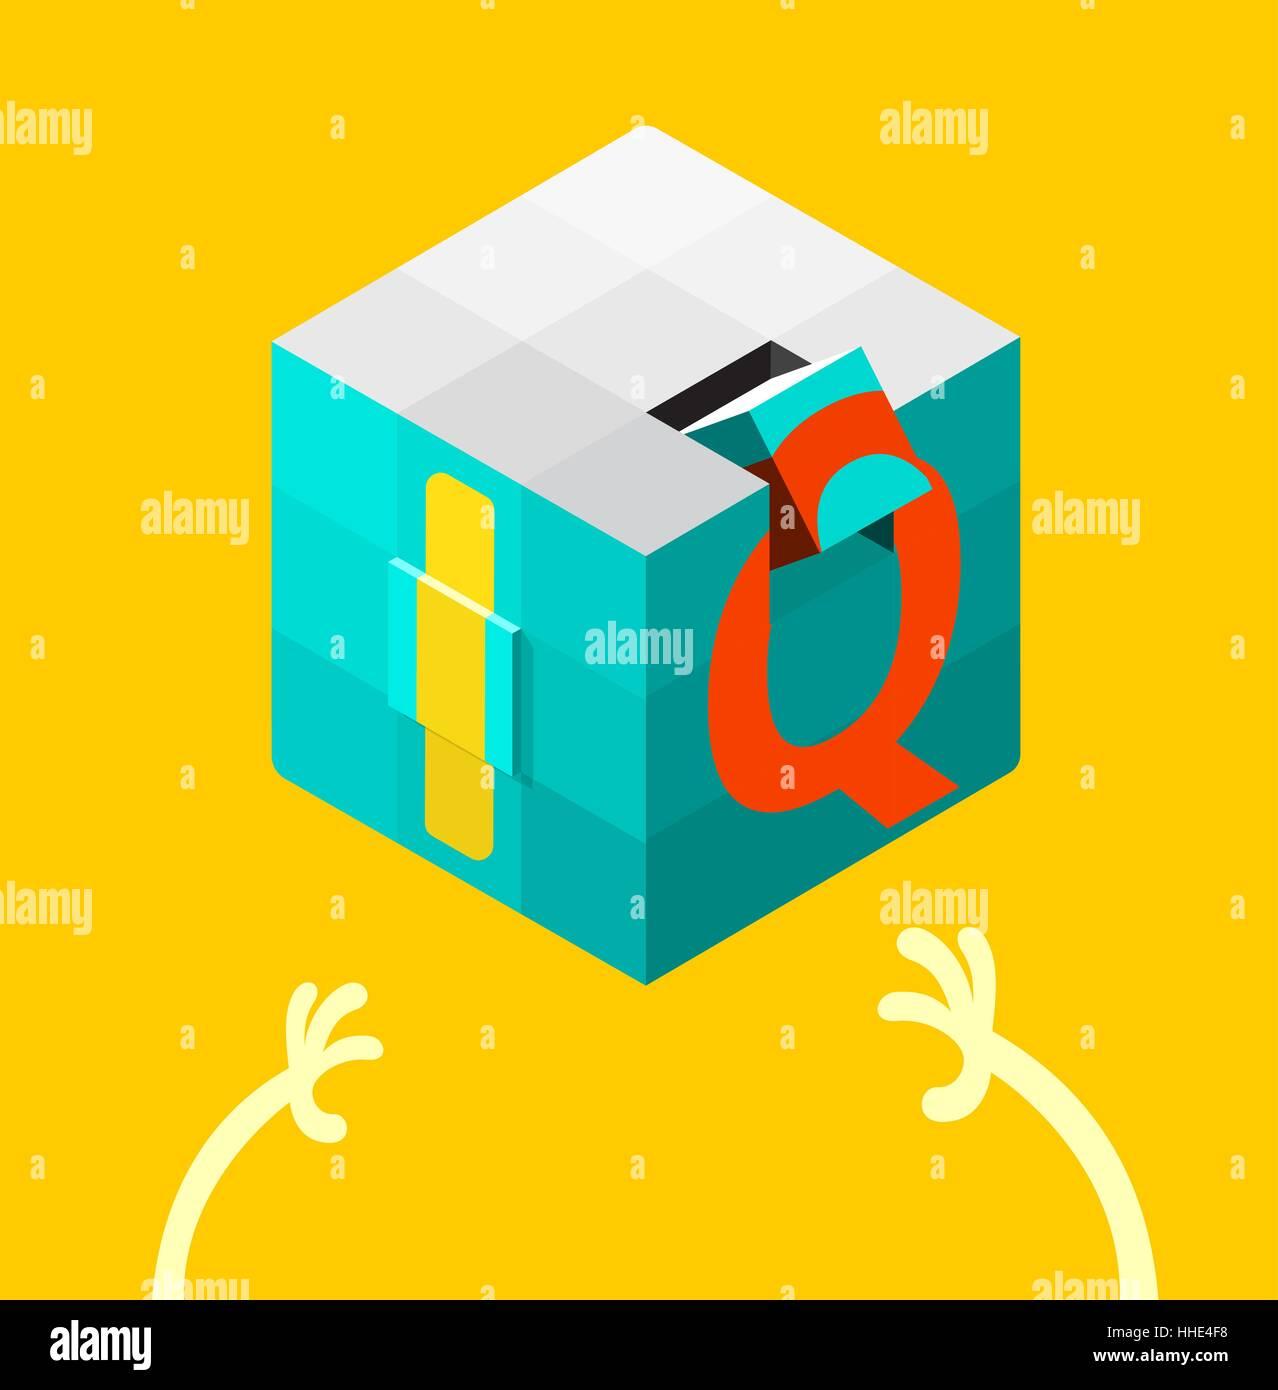 Intelligence quotient (IQ) test concept. vector illustration. - Stock Image